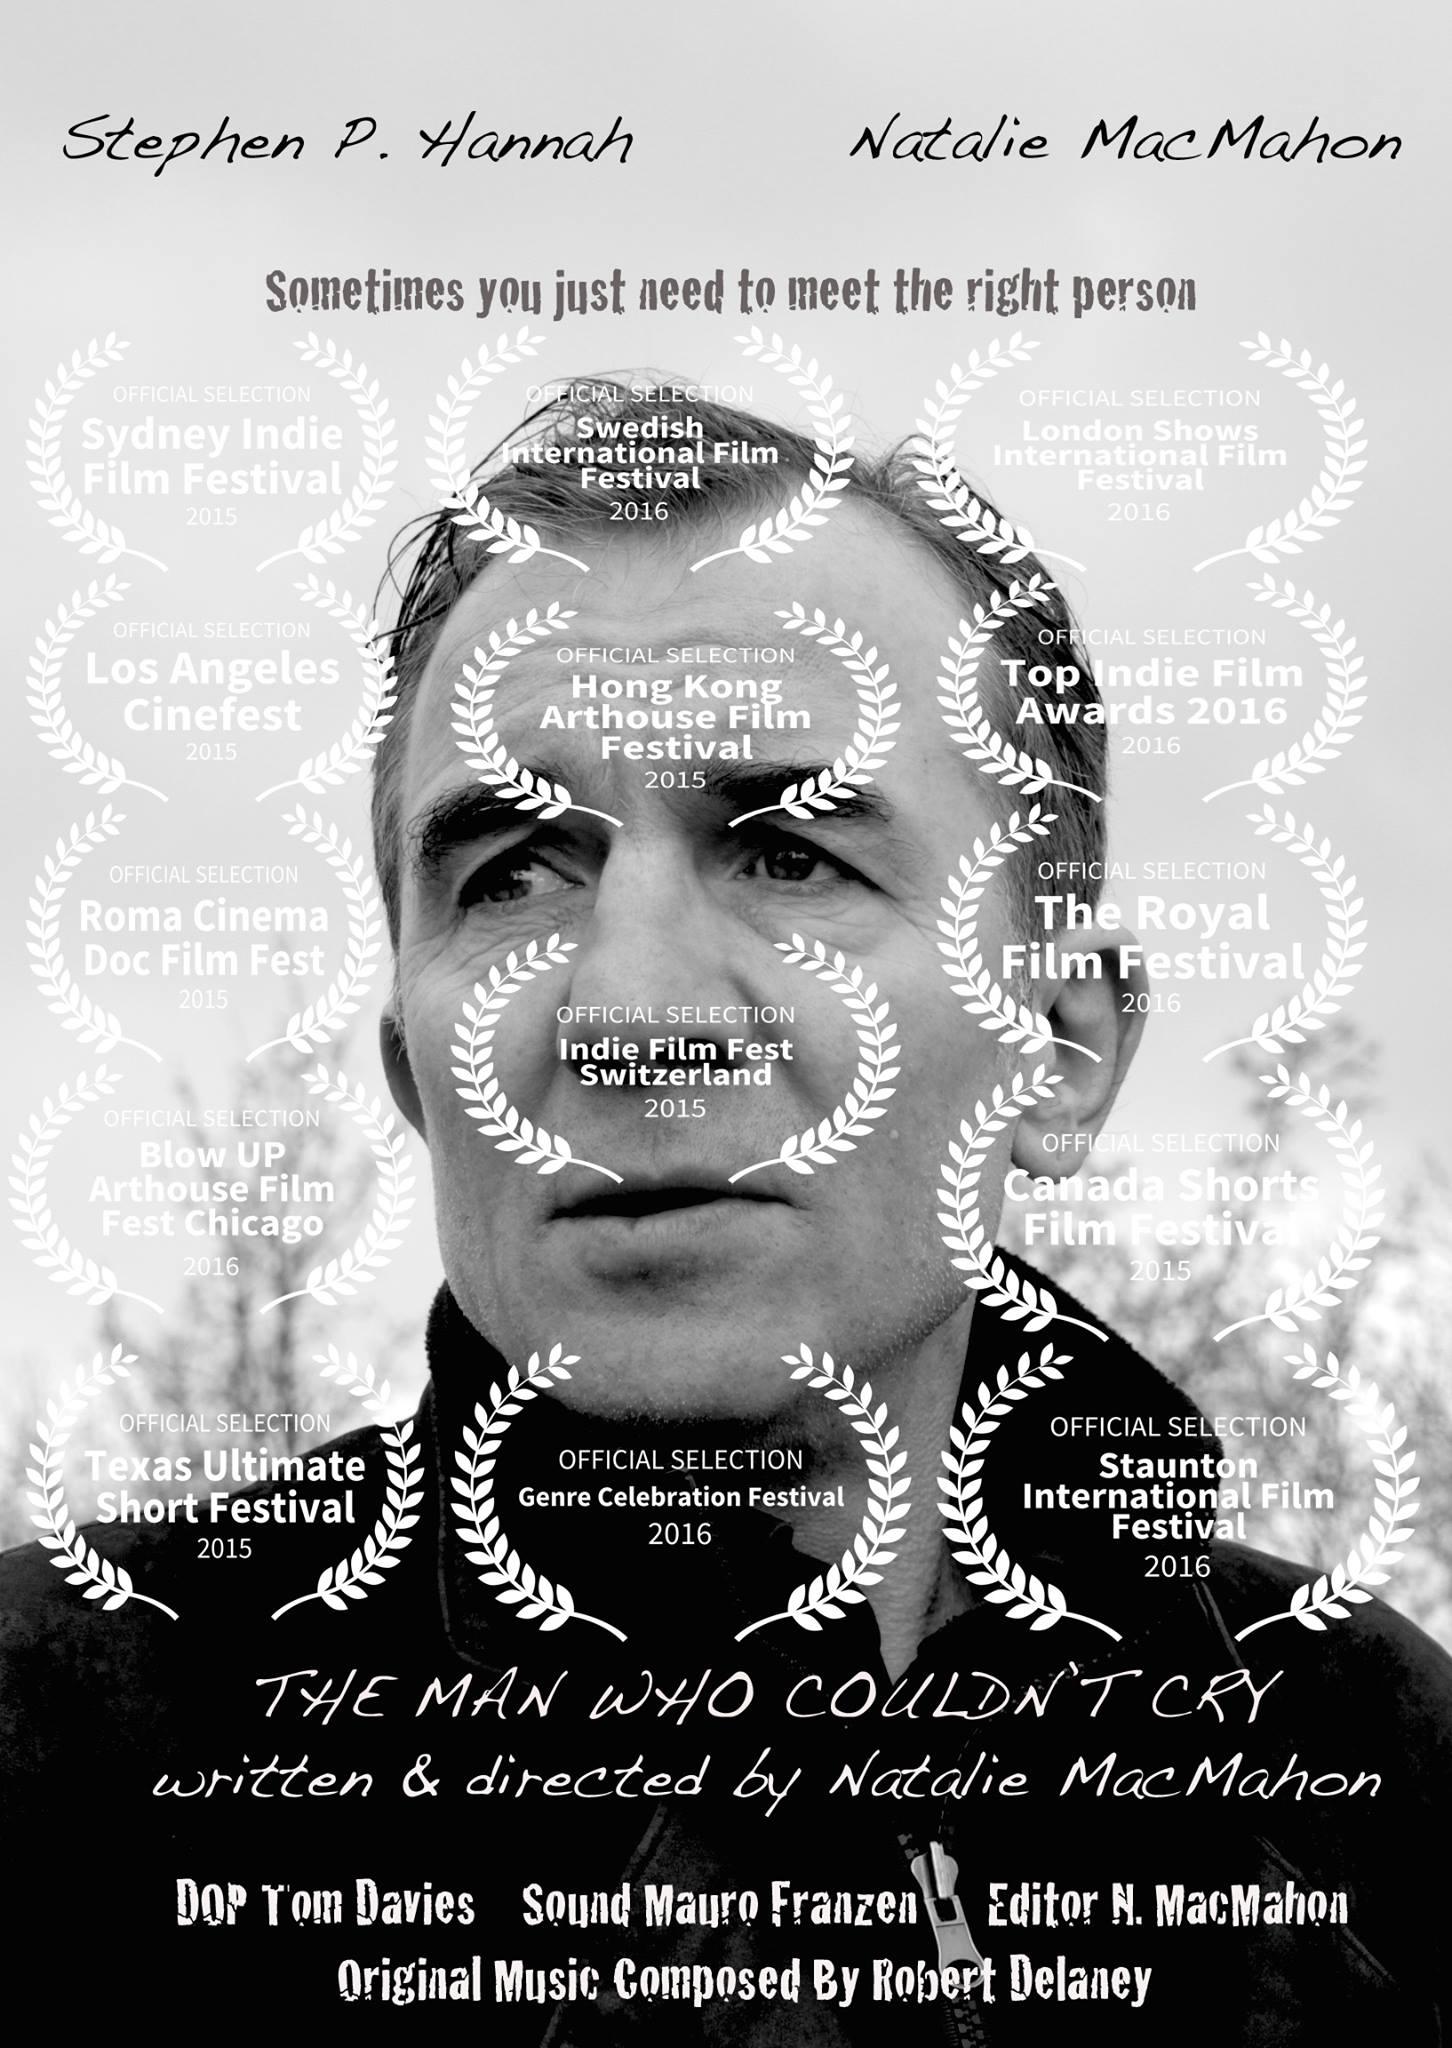 man who poster.jpg